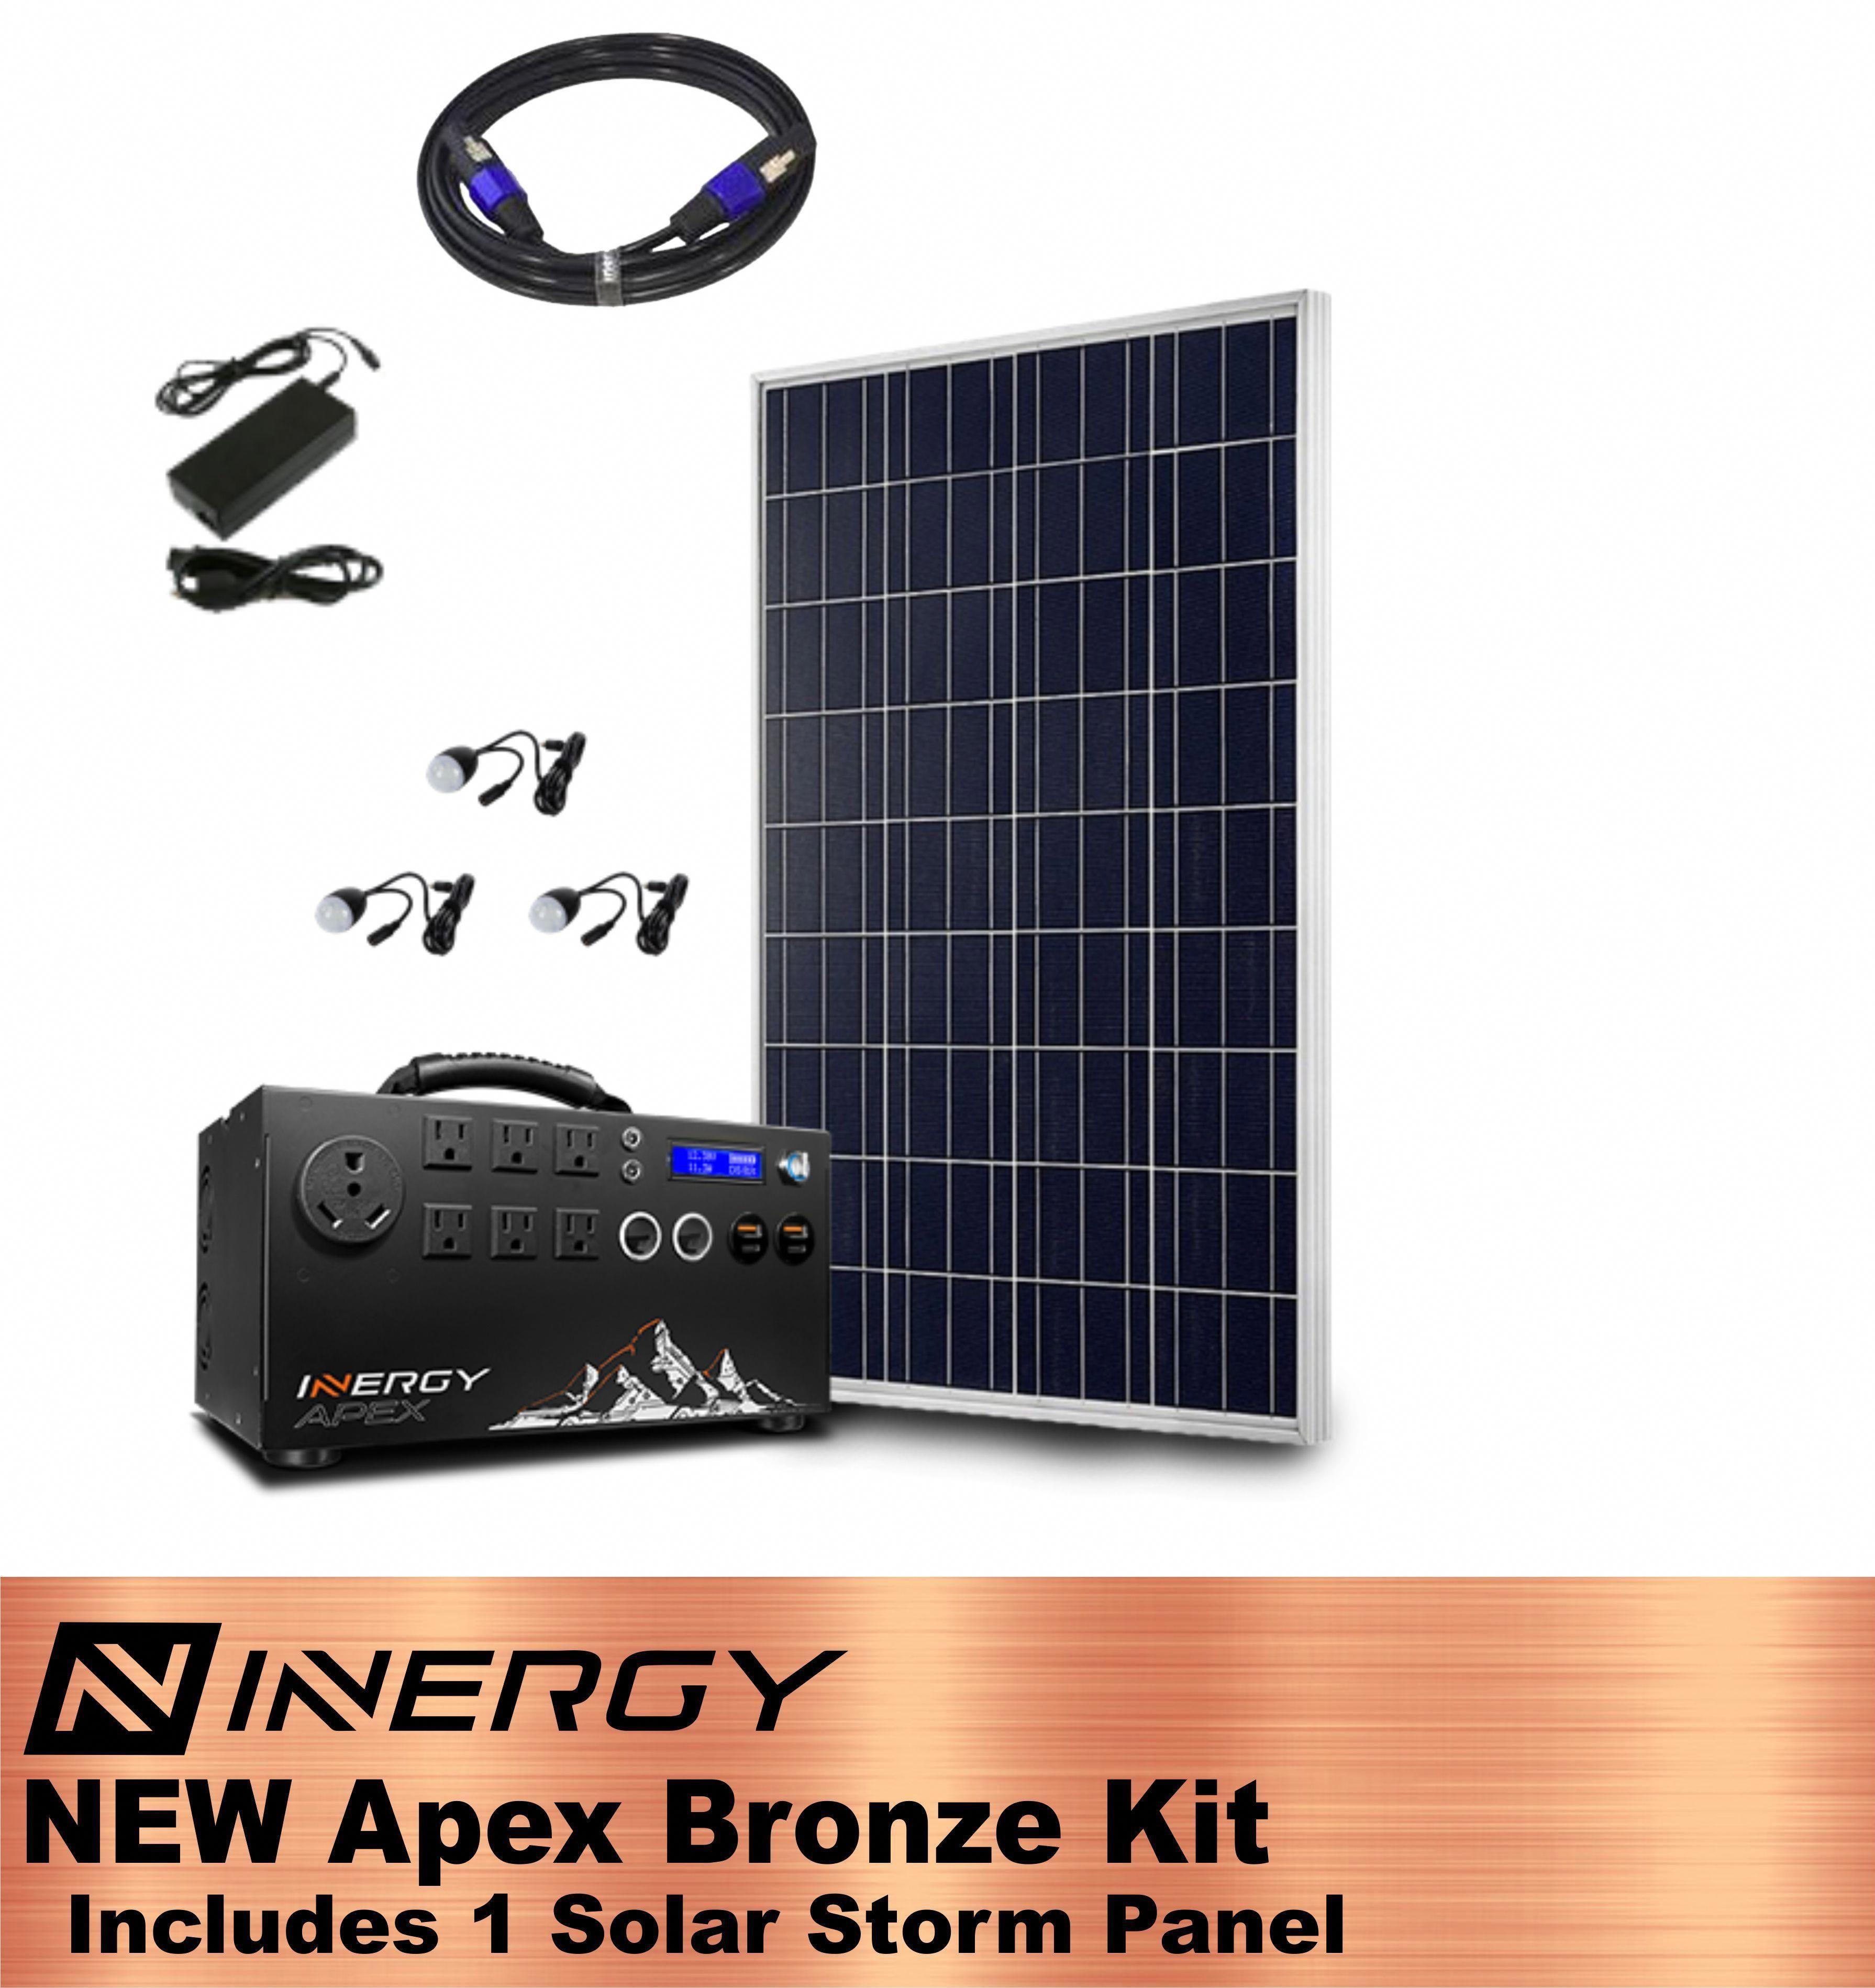 Presale Inergy Apex Solar Generator Bronze Kit With 1 Solar Storm Panel Solarpanels Solarenergy Solarpower So In 2020 Solar Energy Panels Solar Generator Solar Panels